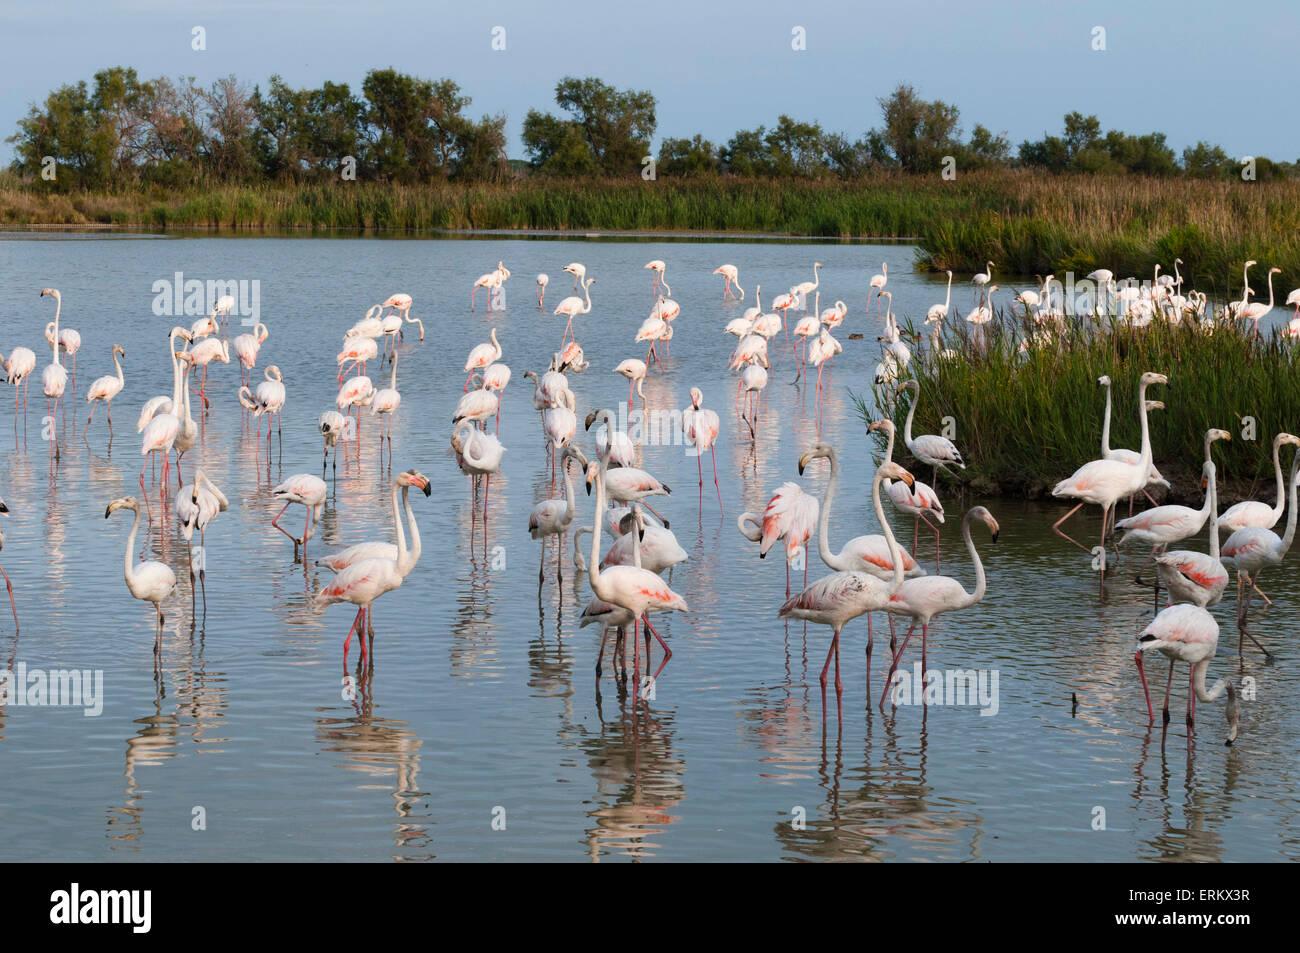 Greater flamingo (Phoenicopterus roseus), Camargue, Provence-Alpes-Cote d'Azur, France, Europe - Stock Image